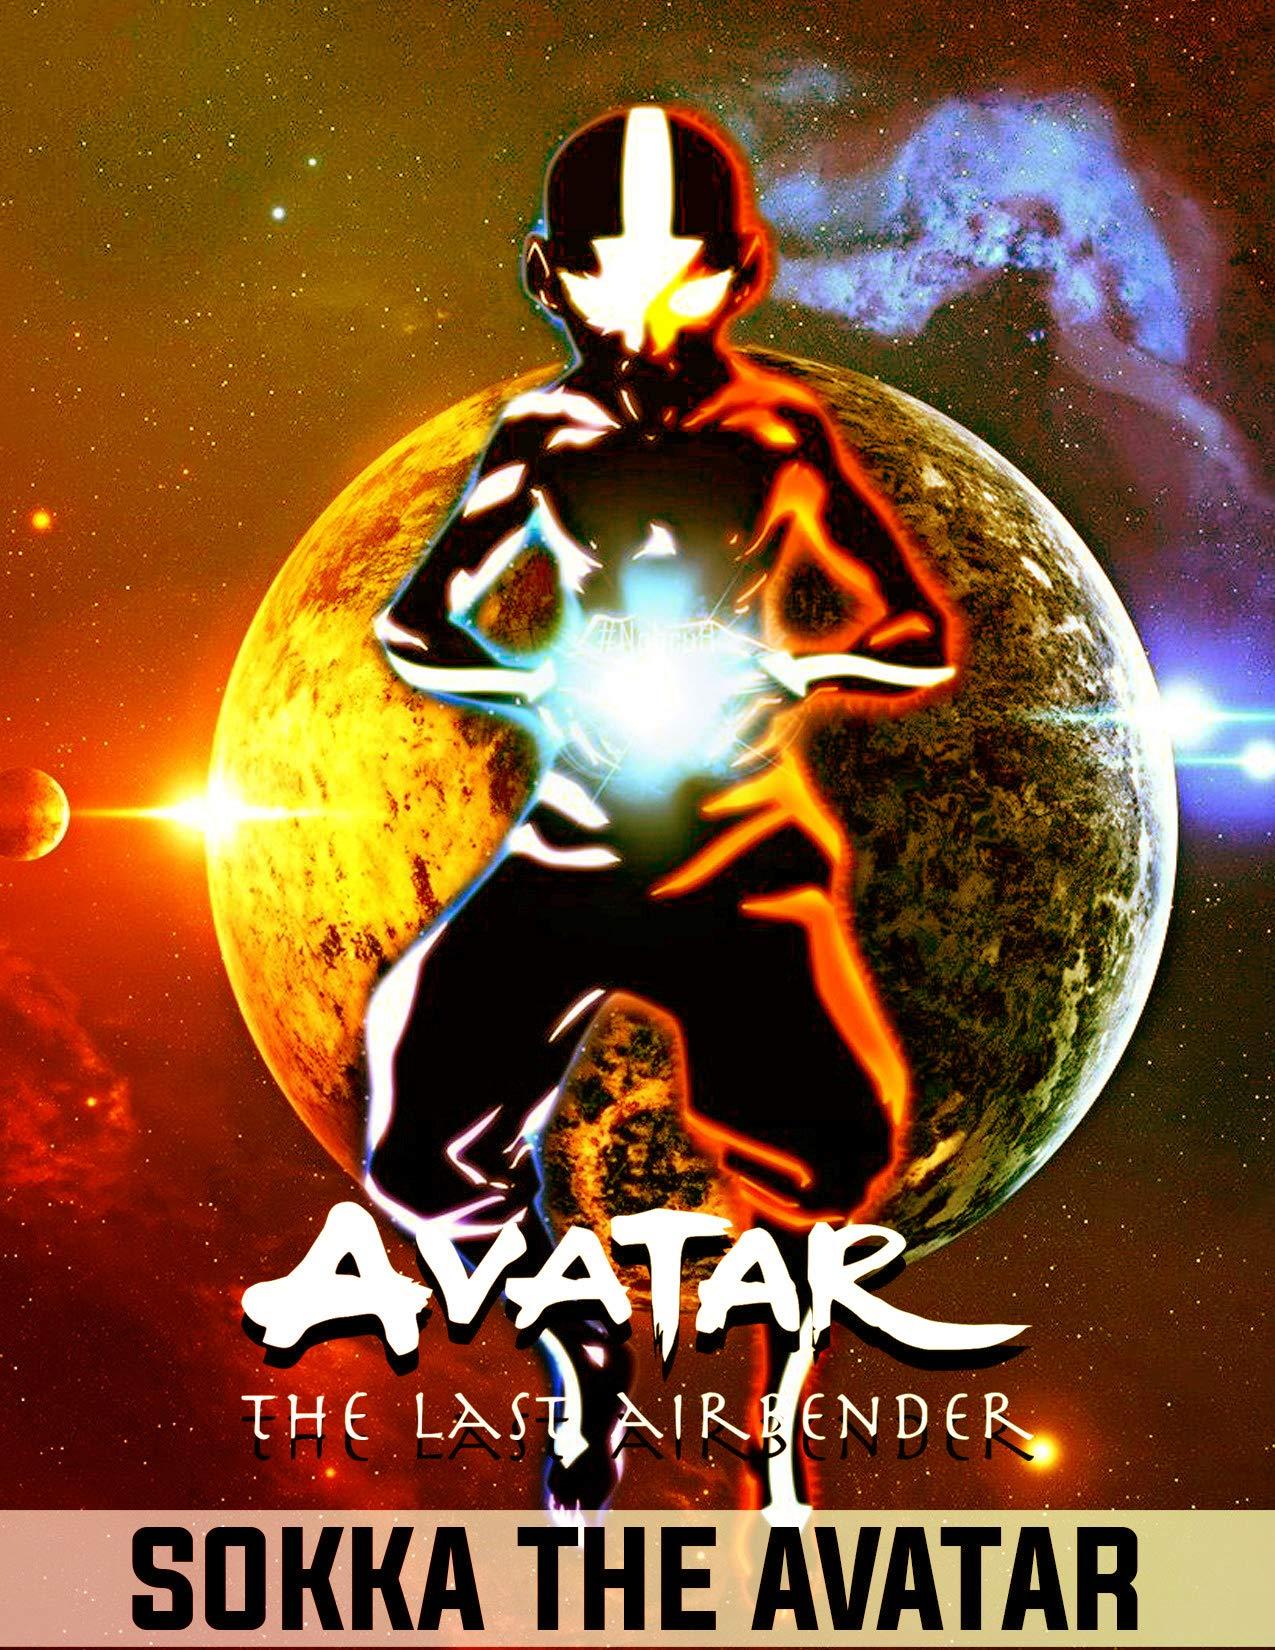 Avatar: The Last Airbender Nickelodeon Avatar Sokka, the Avatar Comics Books Collection American action adventure fantasy Fan